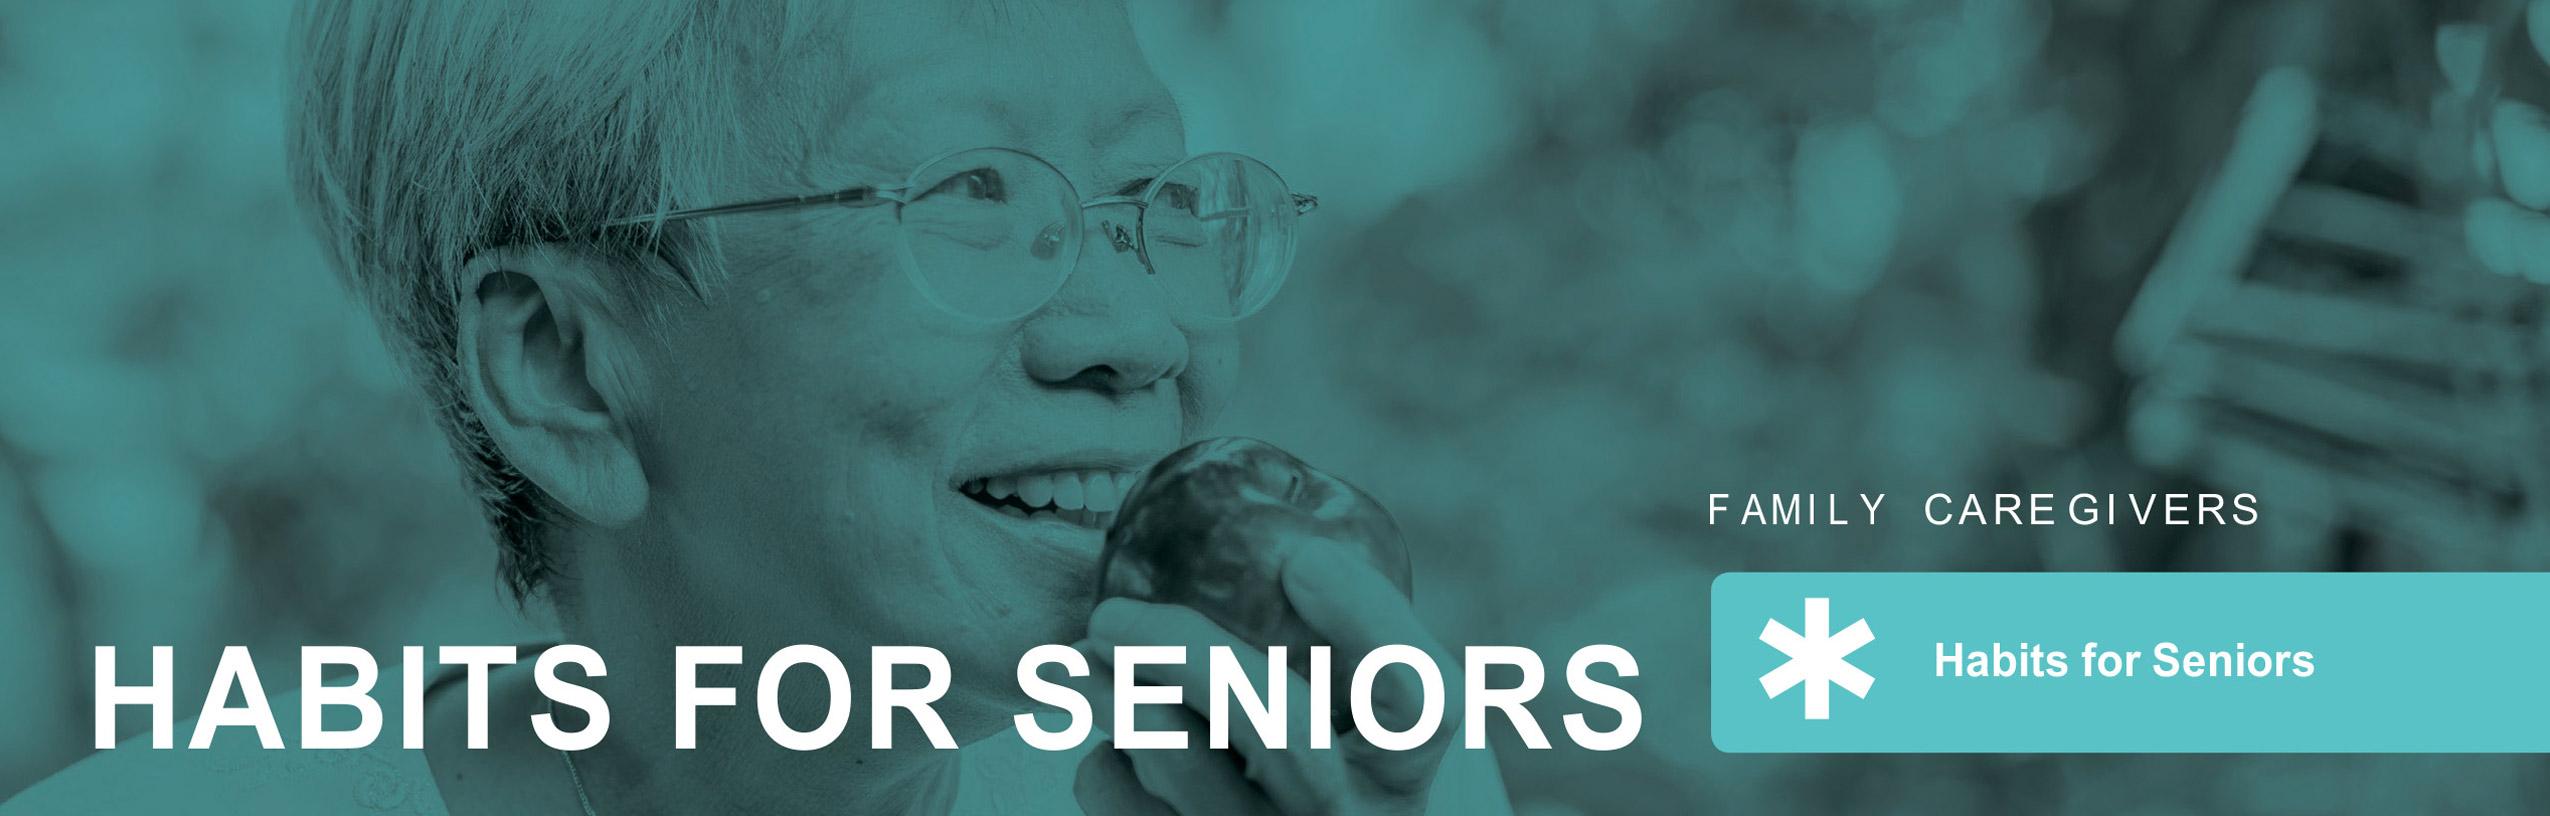 habits for seniors